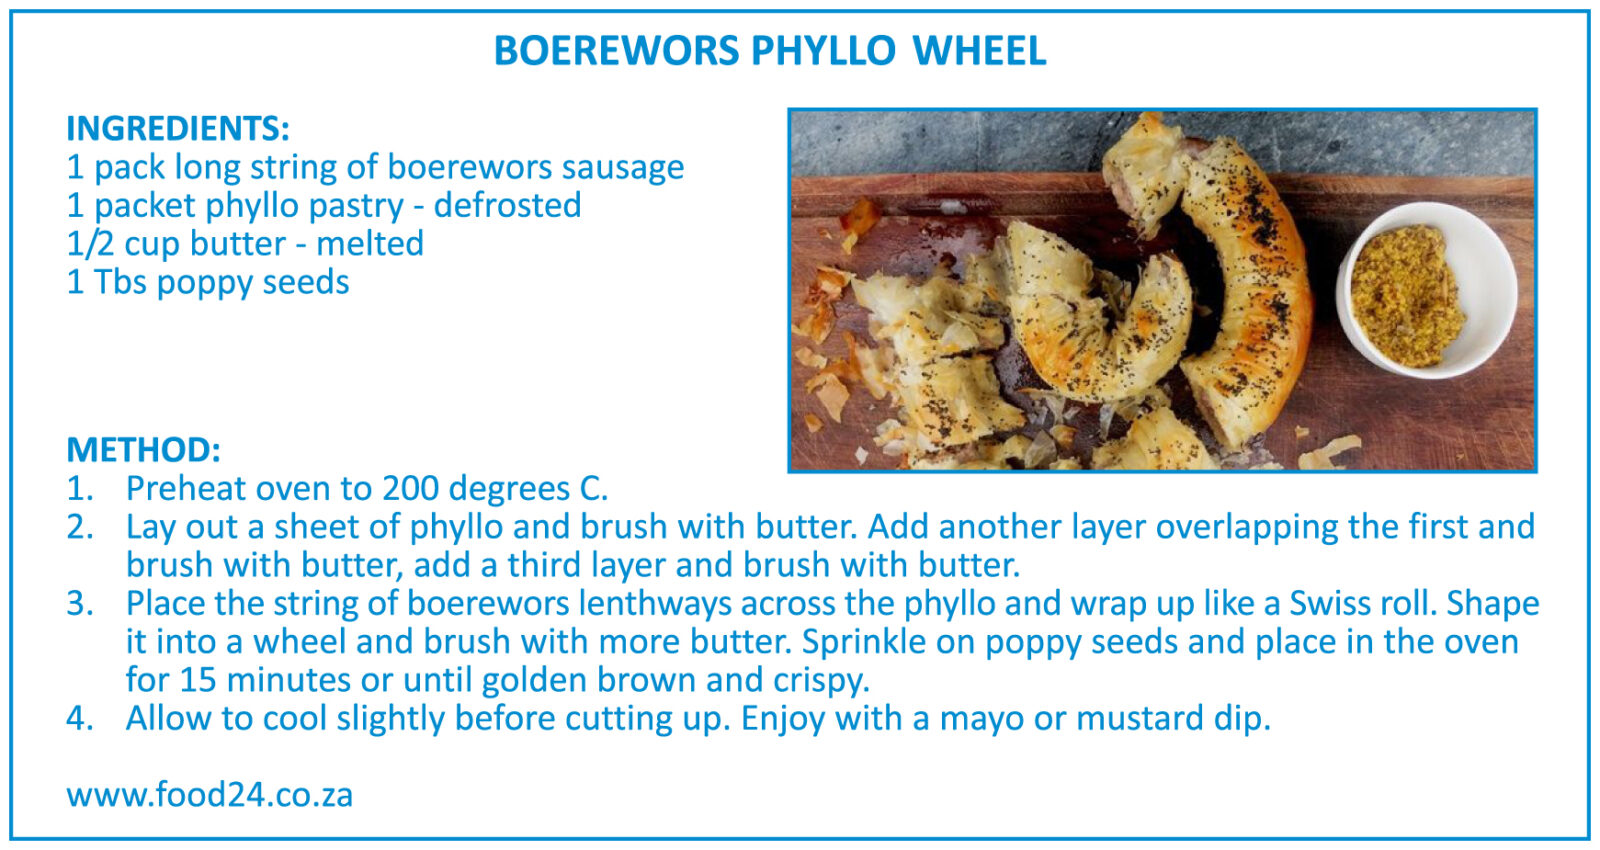 Boerewors Phyllo Wheel